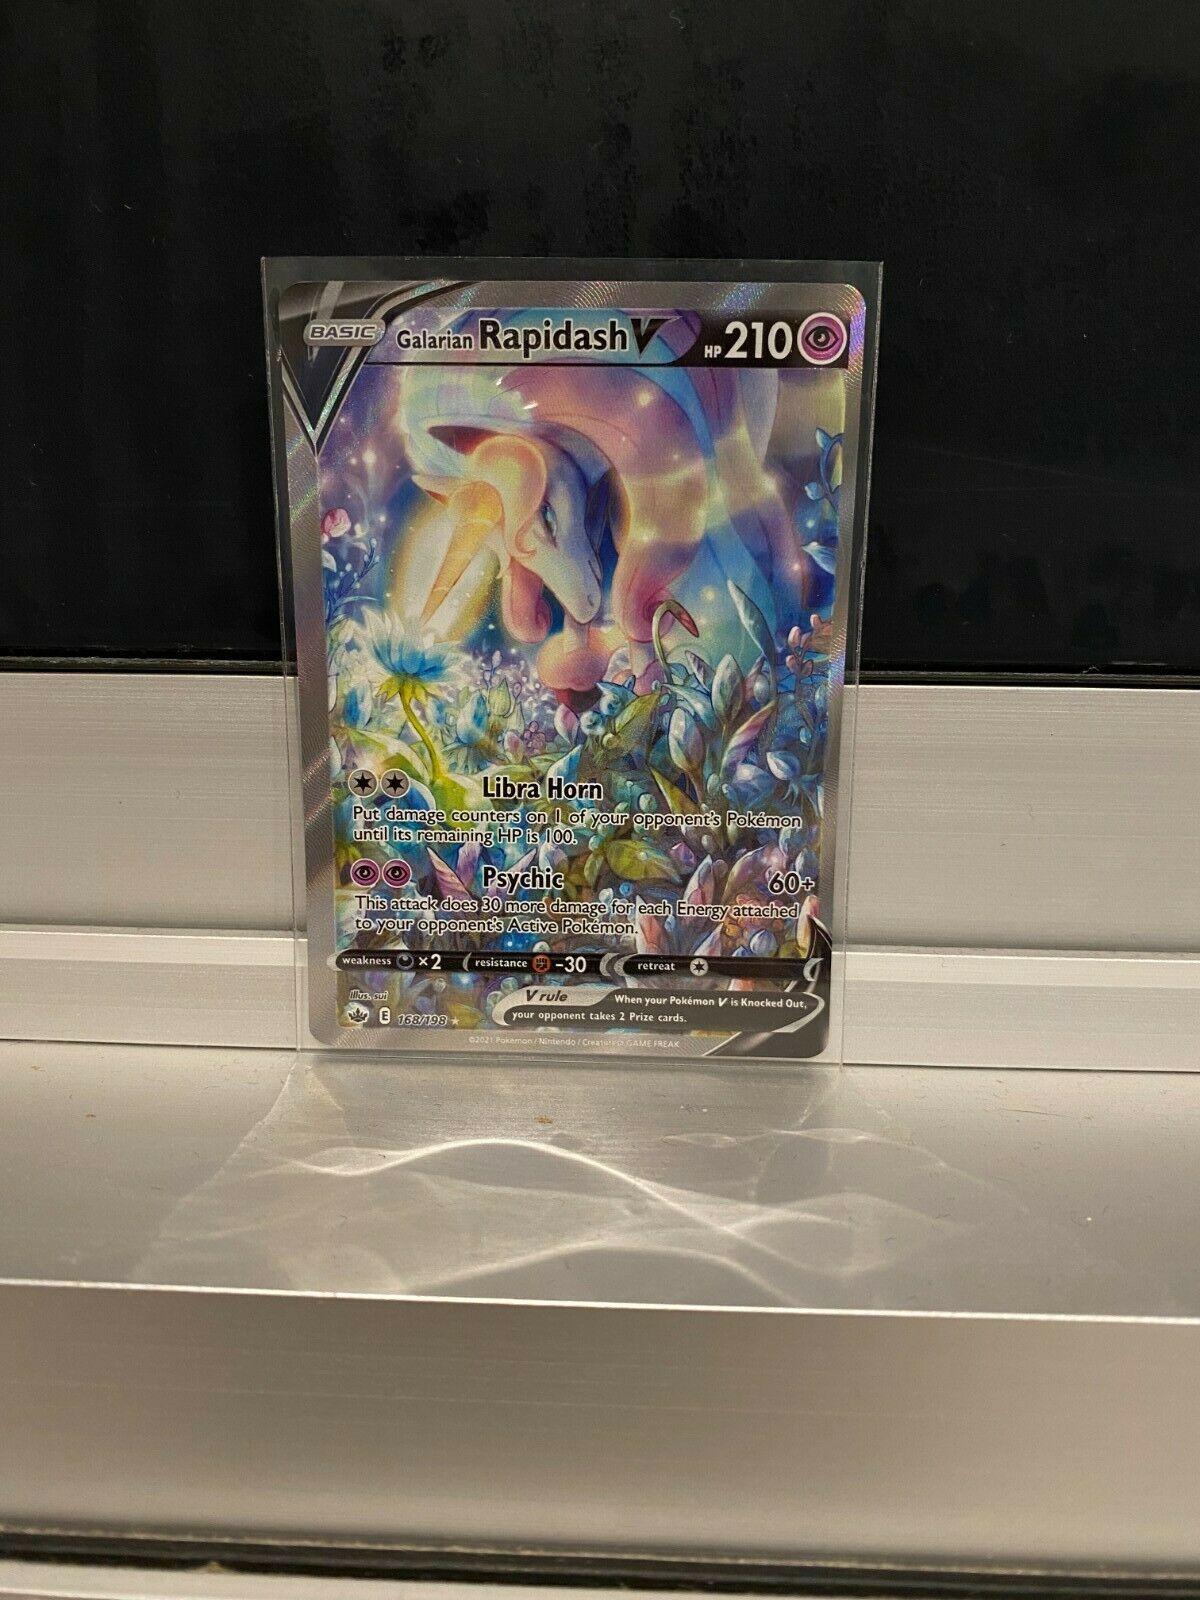 GALARIAN RAPIDASH V 168/198 FULL ART Pokemon Card *Chilling Reign* Mint cond.